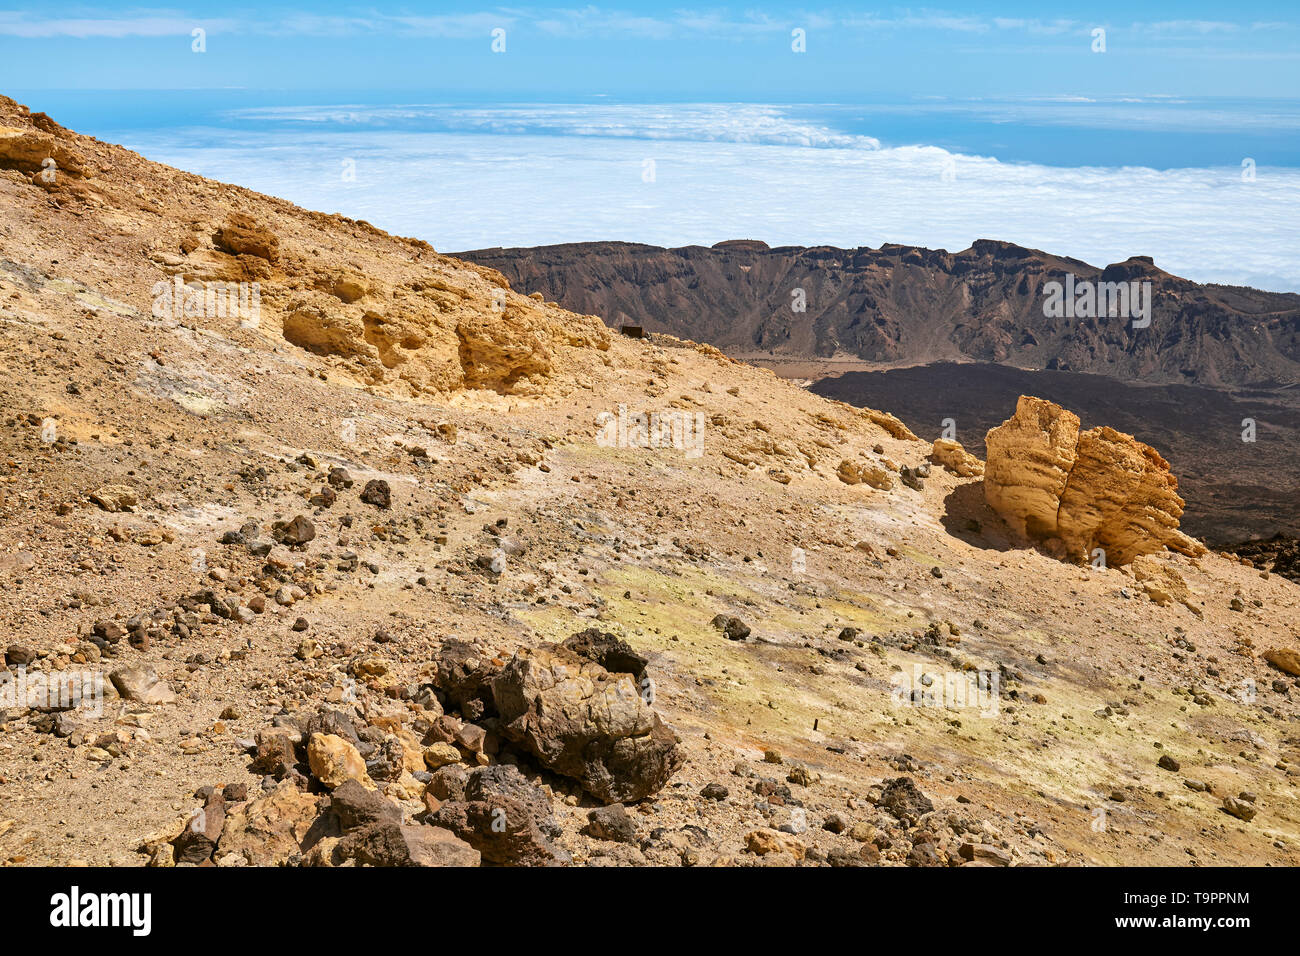 Top of the Mount Teide Volcanic scenery, Teide National Park, Tenerife, Spain. - Stock Image